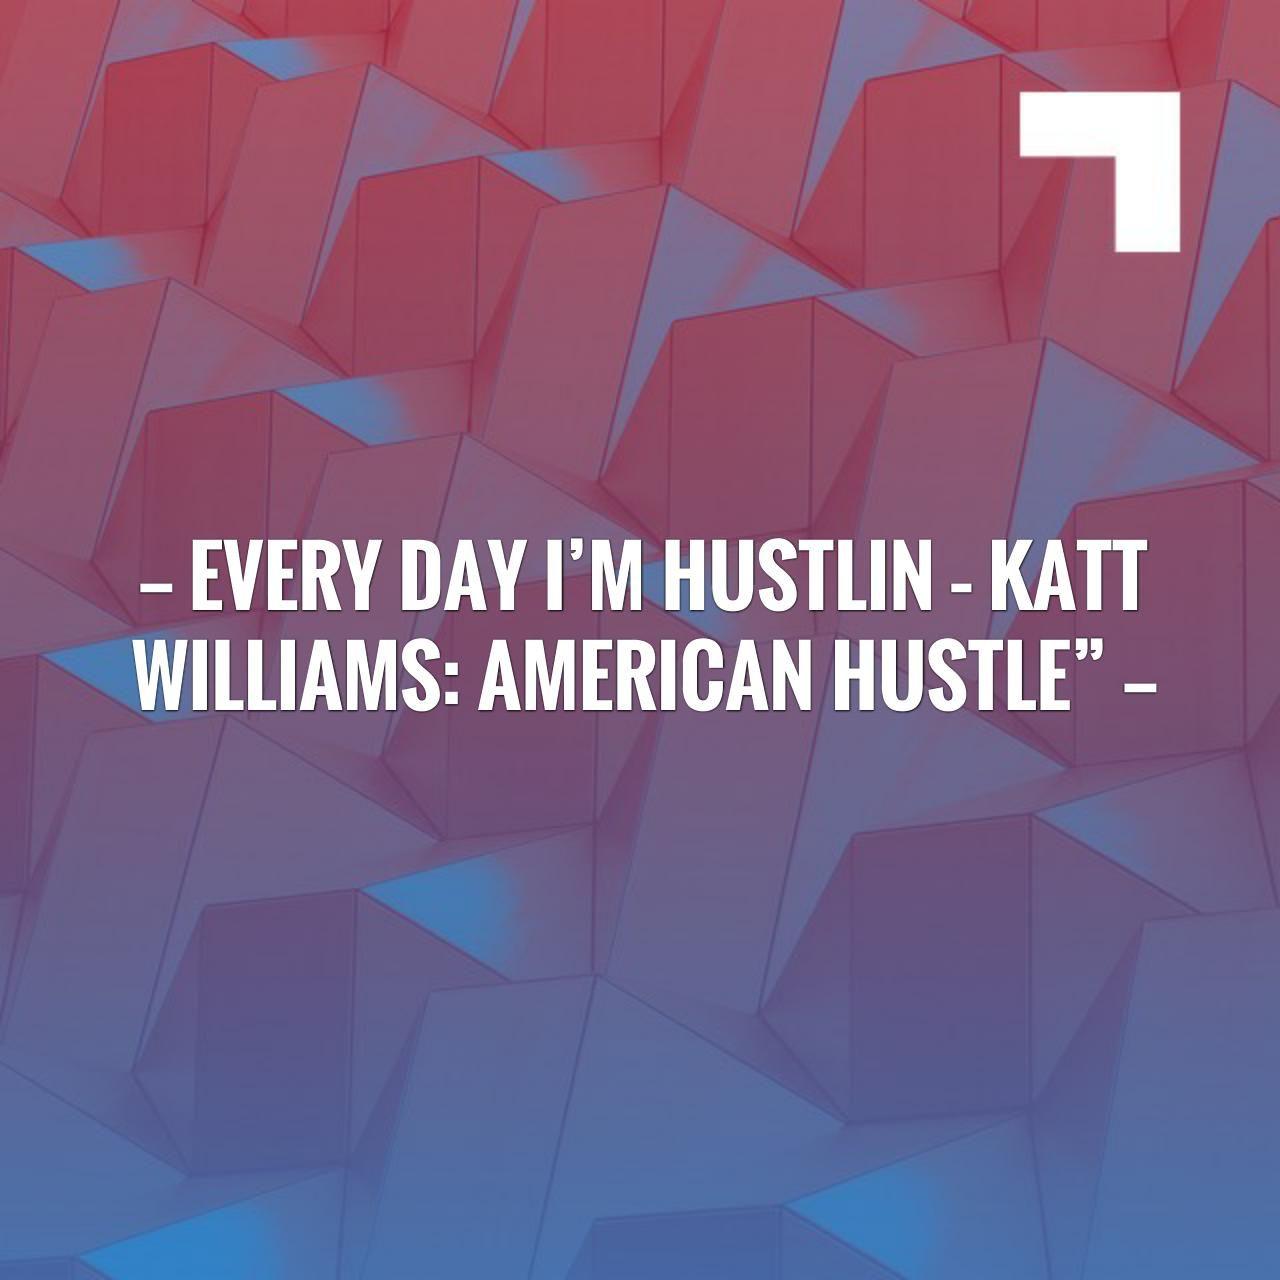 Every day im hustlin katt williams american hustle